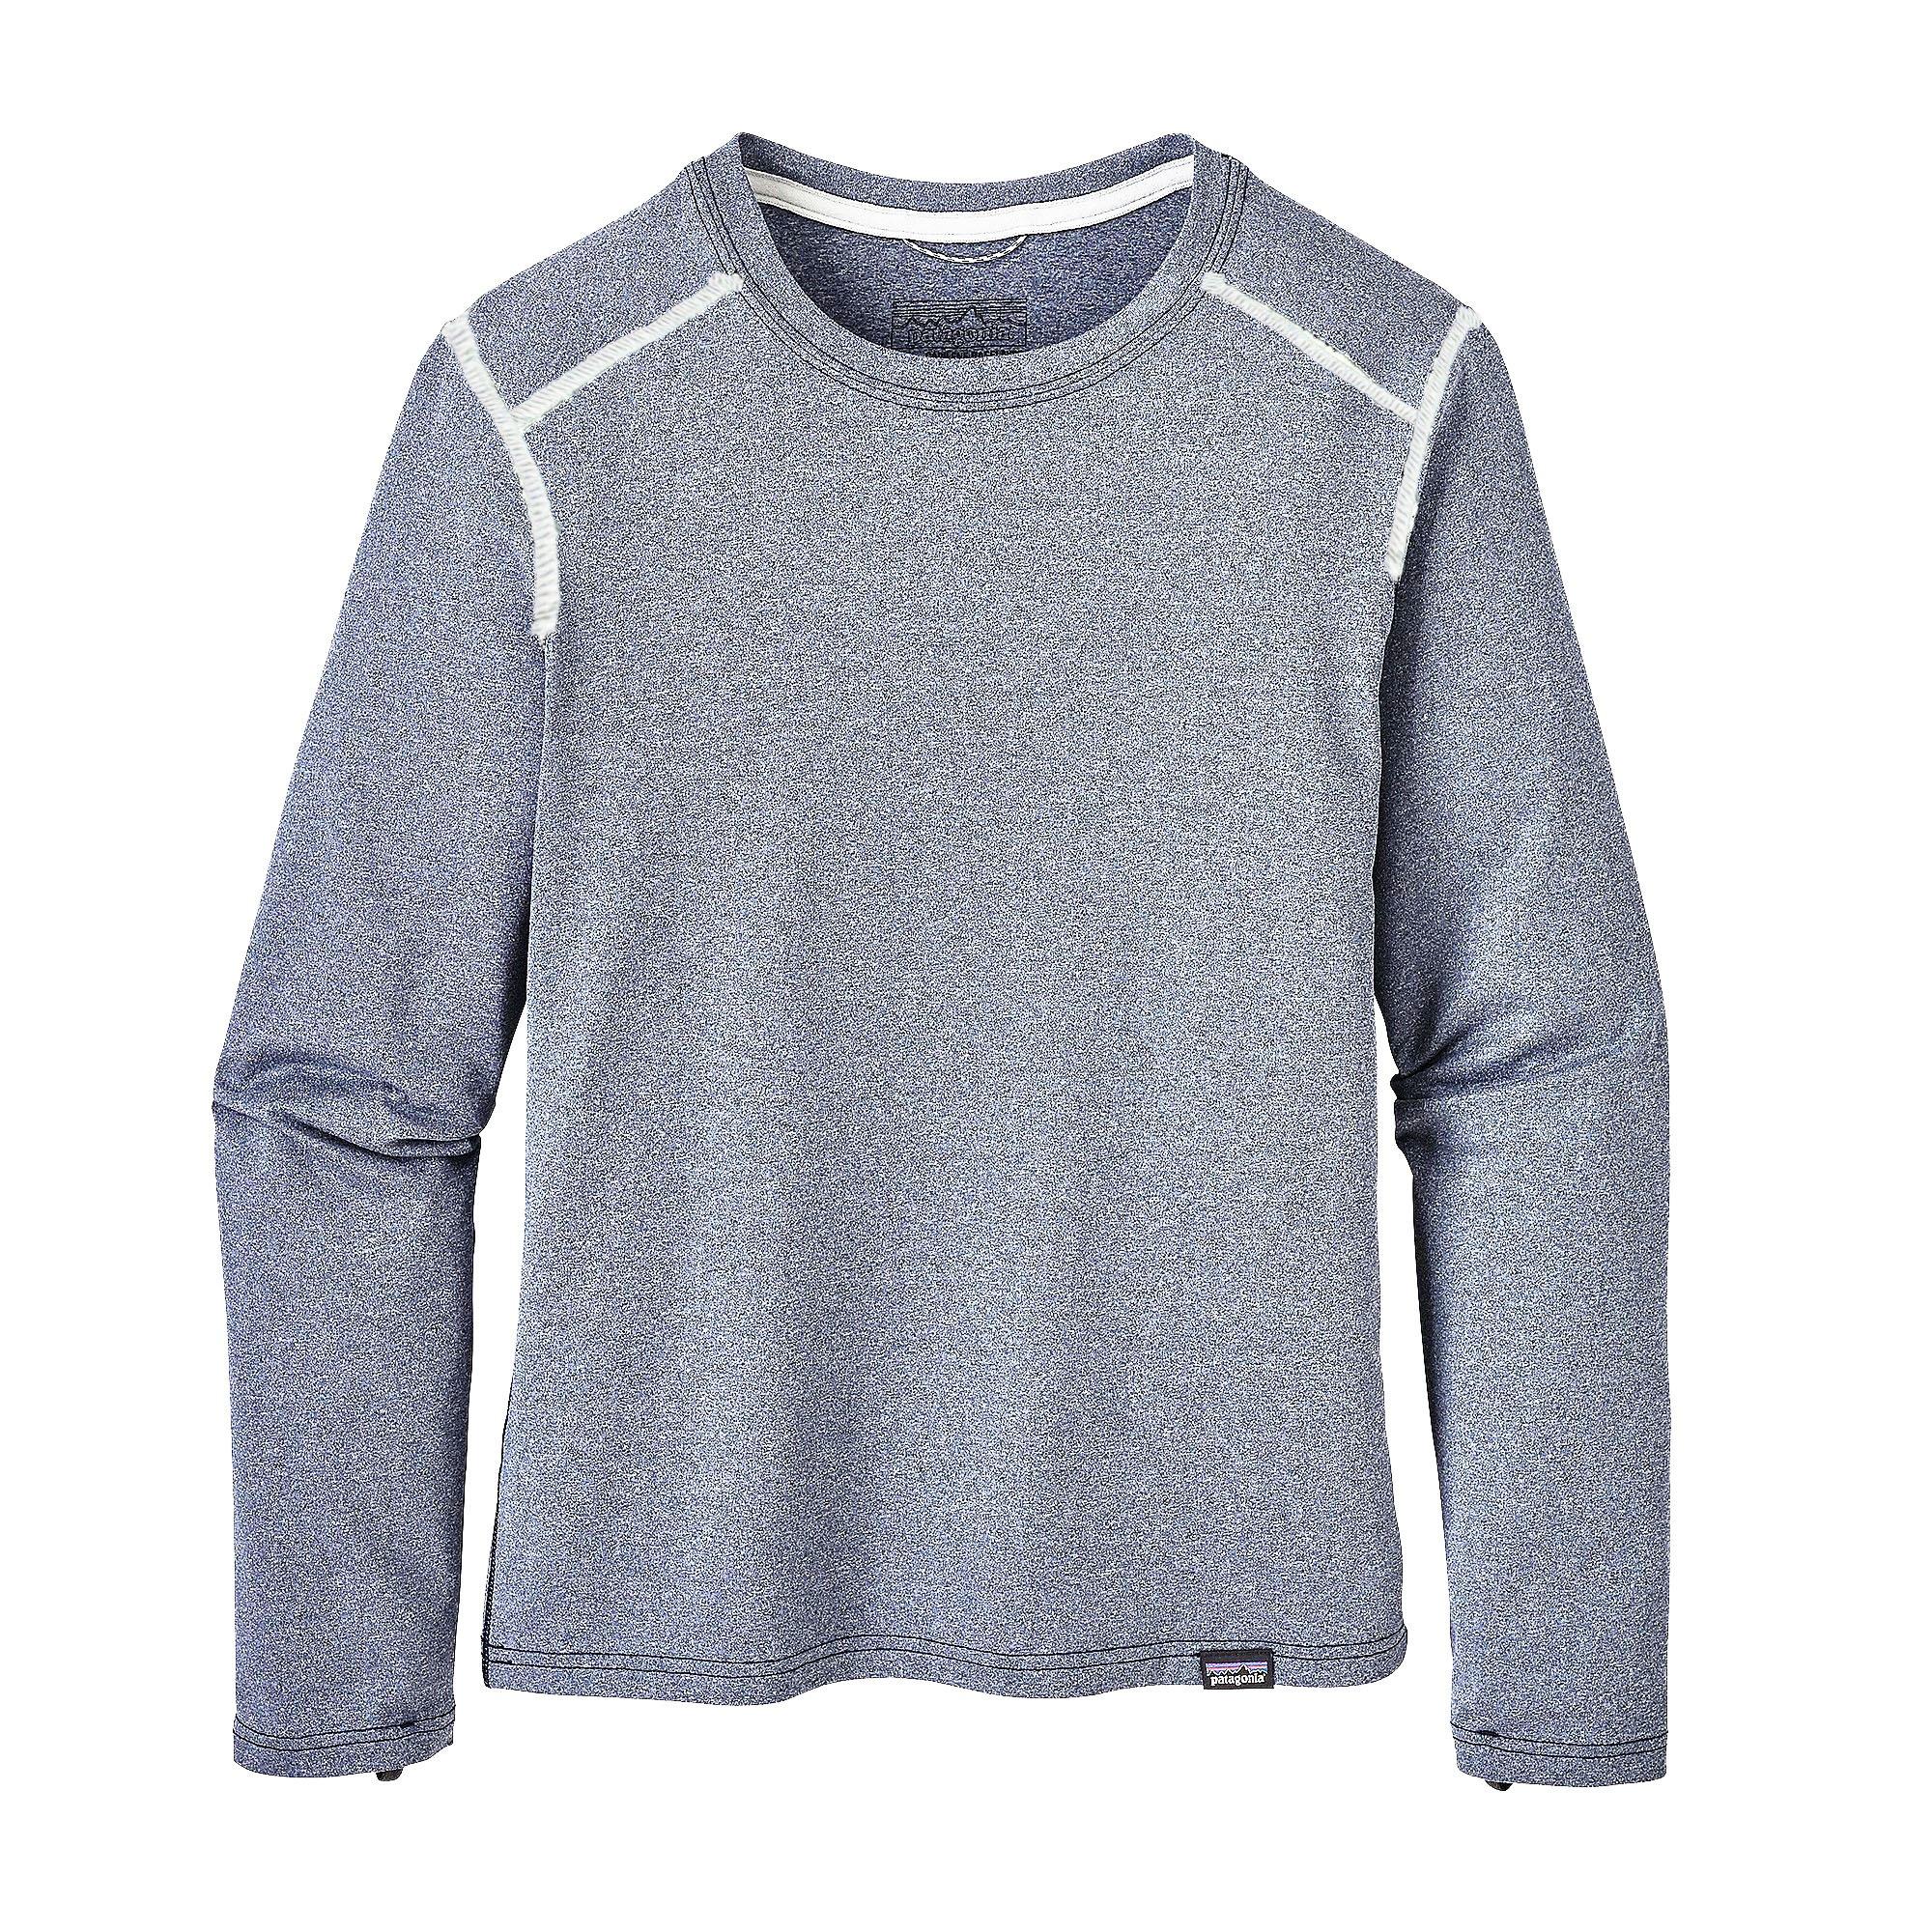 Patagonia Boy's Capilene Crew Shirt - Navy Blue - Small